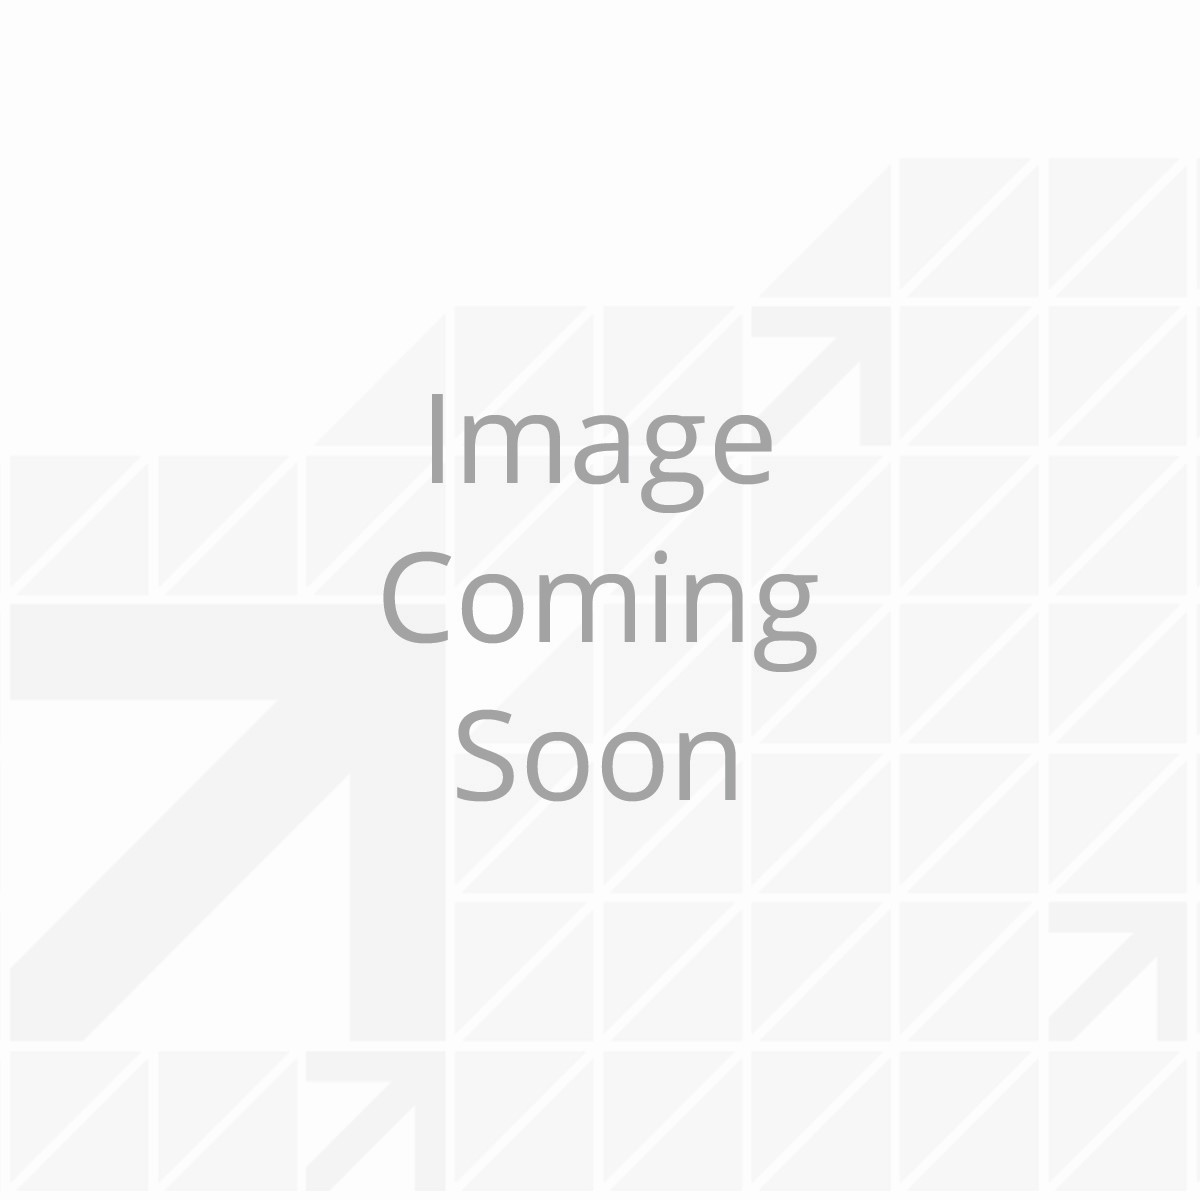 "Lunette Ring Drawbar (22,000 lbs., 3"" I.D.)"